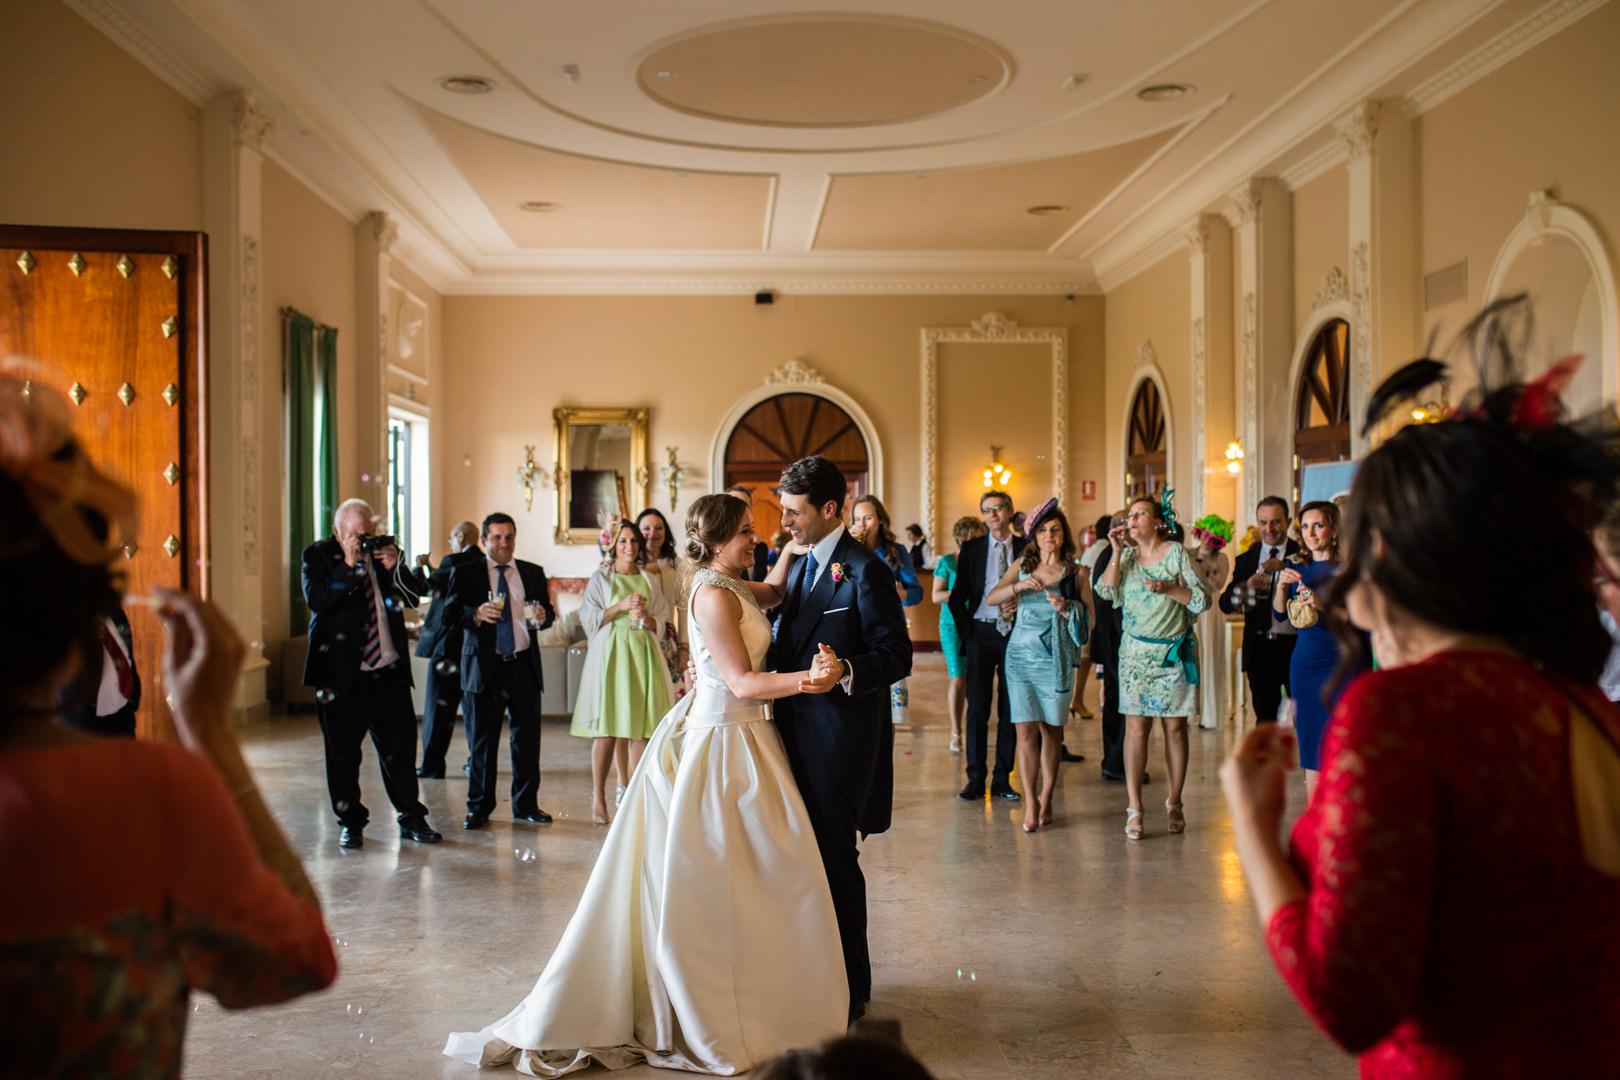 Boda-Catedral-Jaen-Hamburgo-Maria-David-engagement-Rafael-Torres-fotografo-bodas-sevilla-madrid-barcelona-wedding-photographer--39.jpg